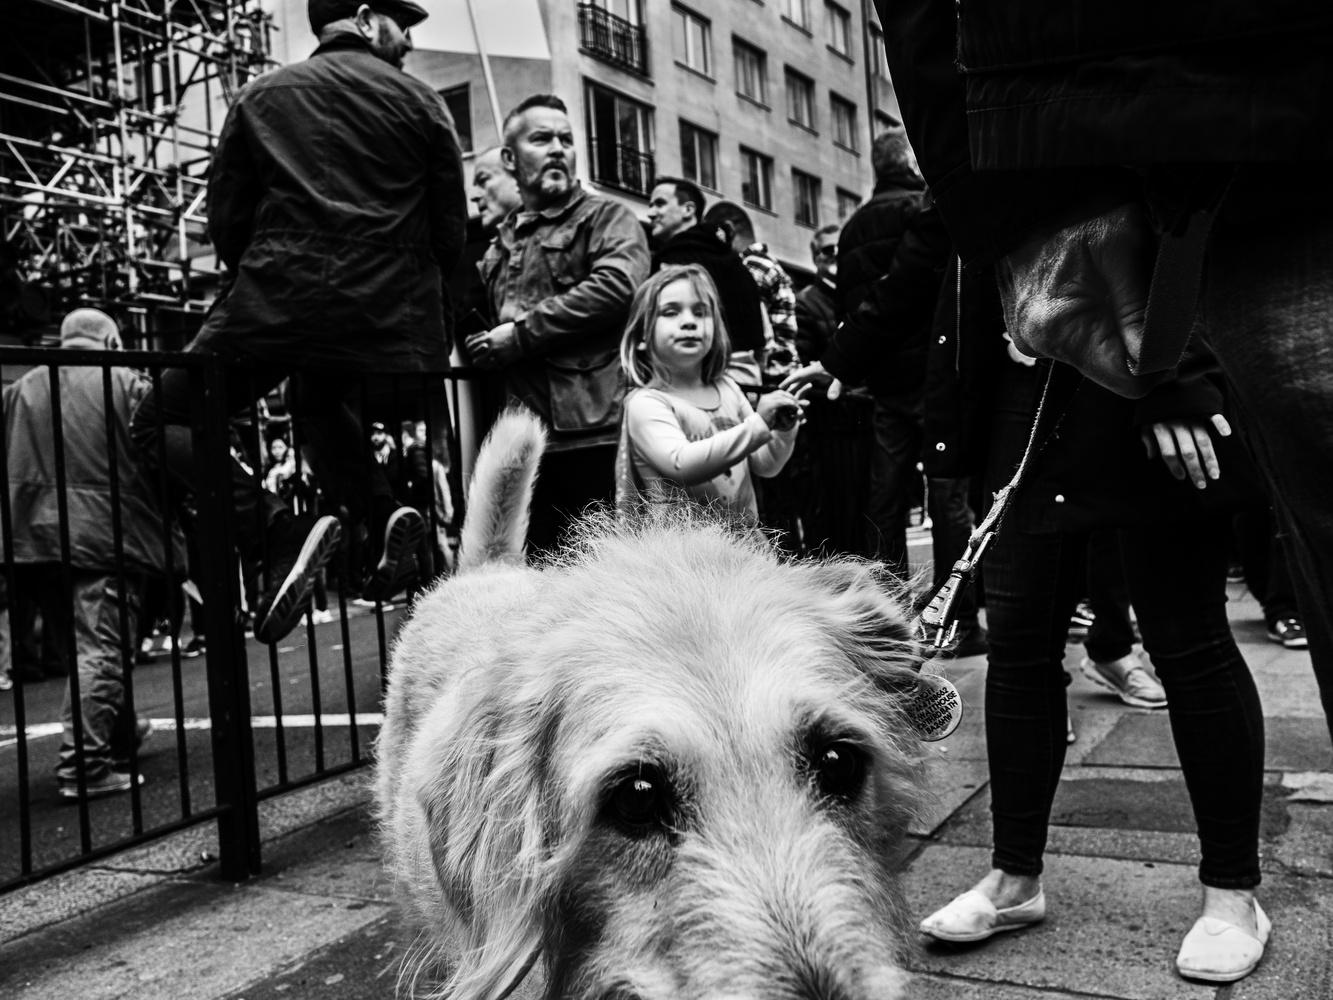 Dog's perspective by Tomasz Kowalski